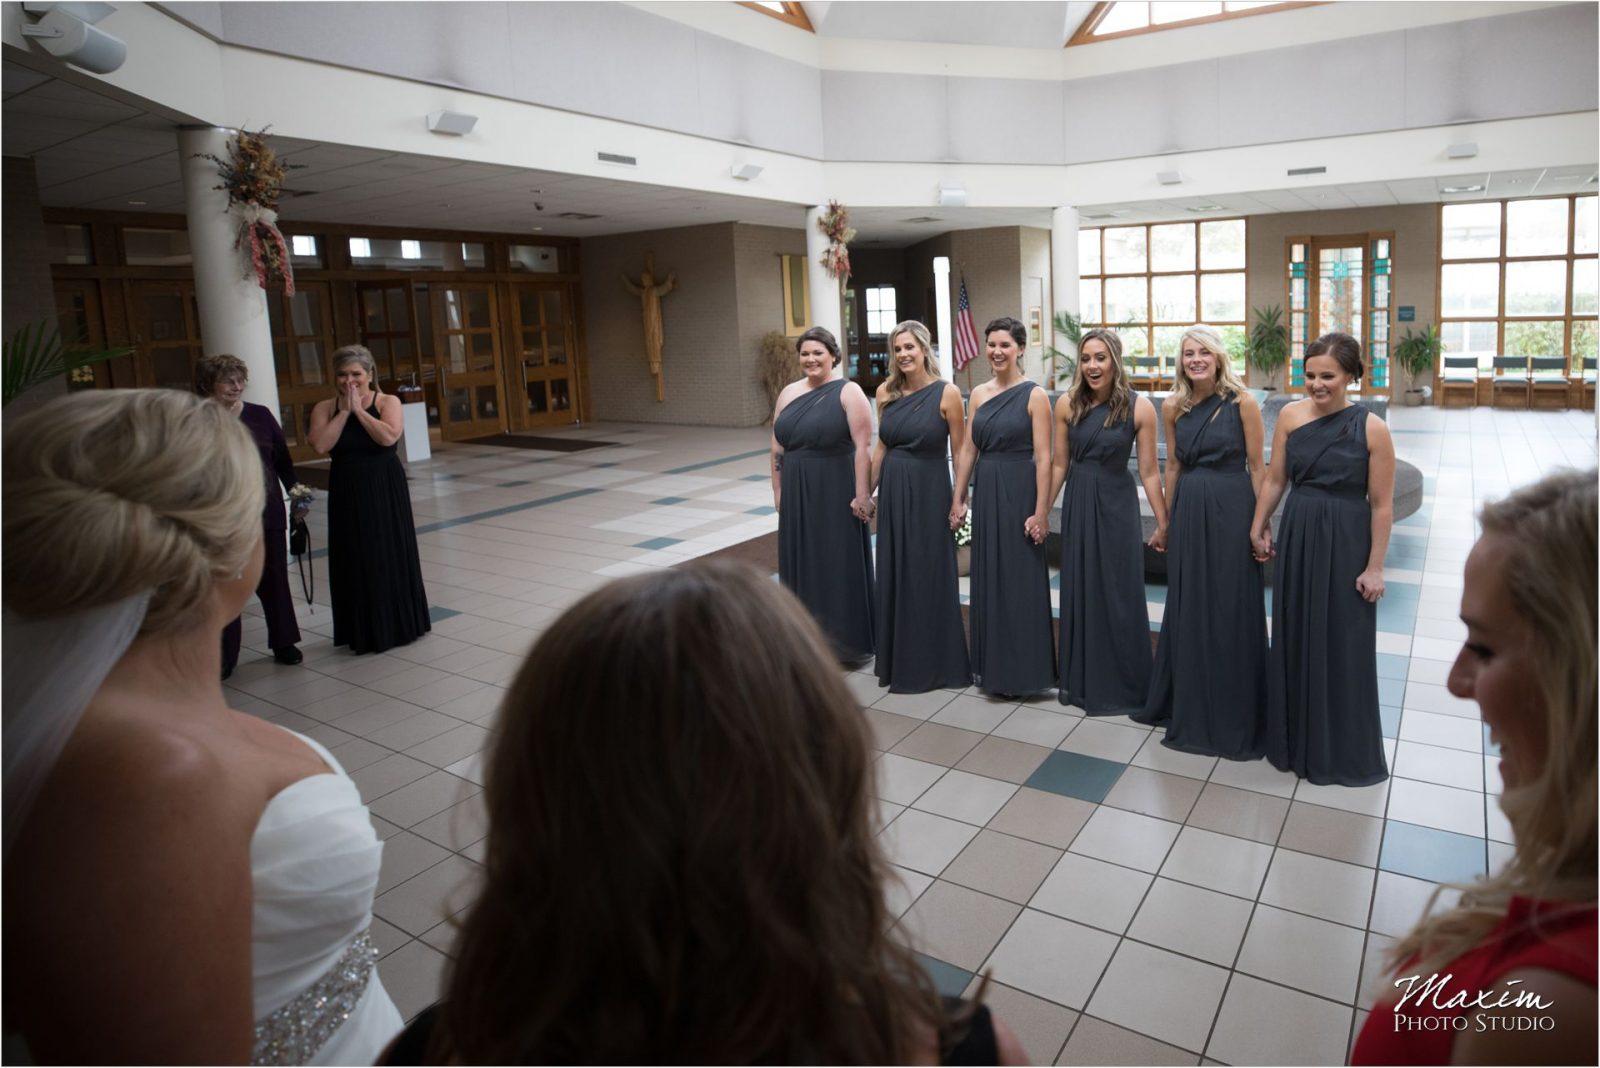 St Charles Borromeo Dayton Ohio wedding bridesmaids reveal